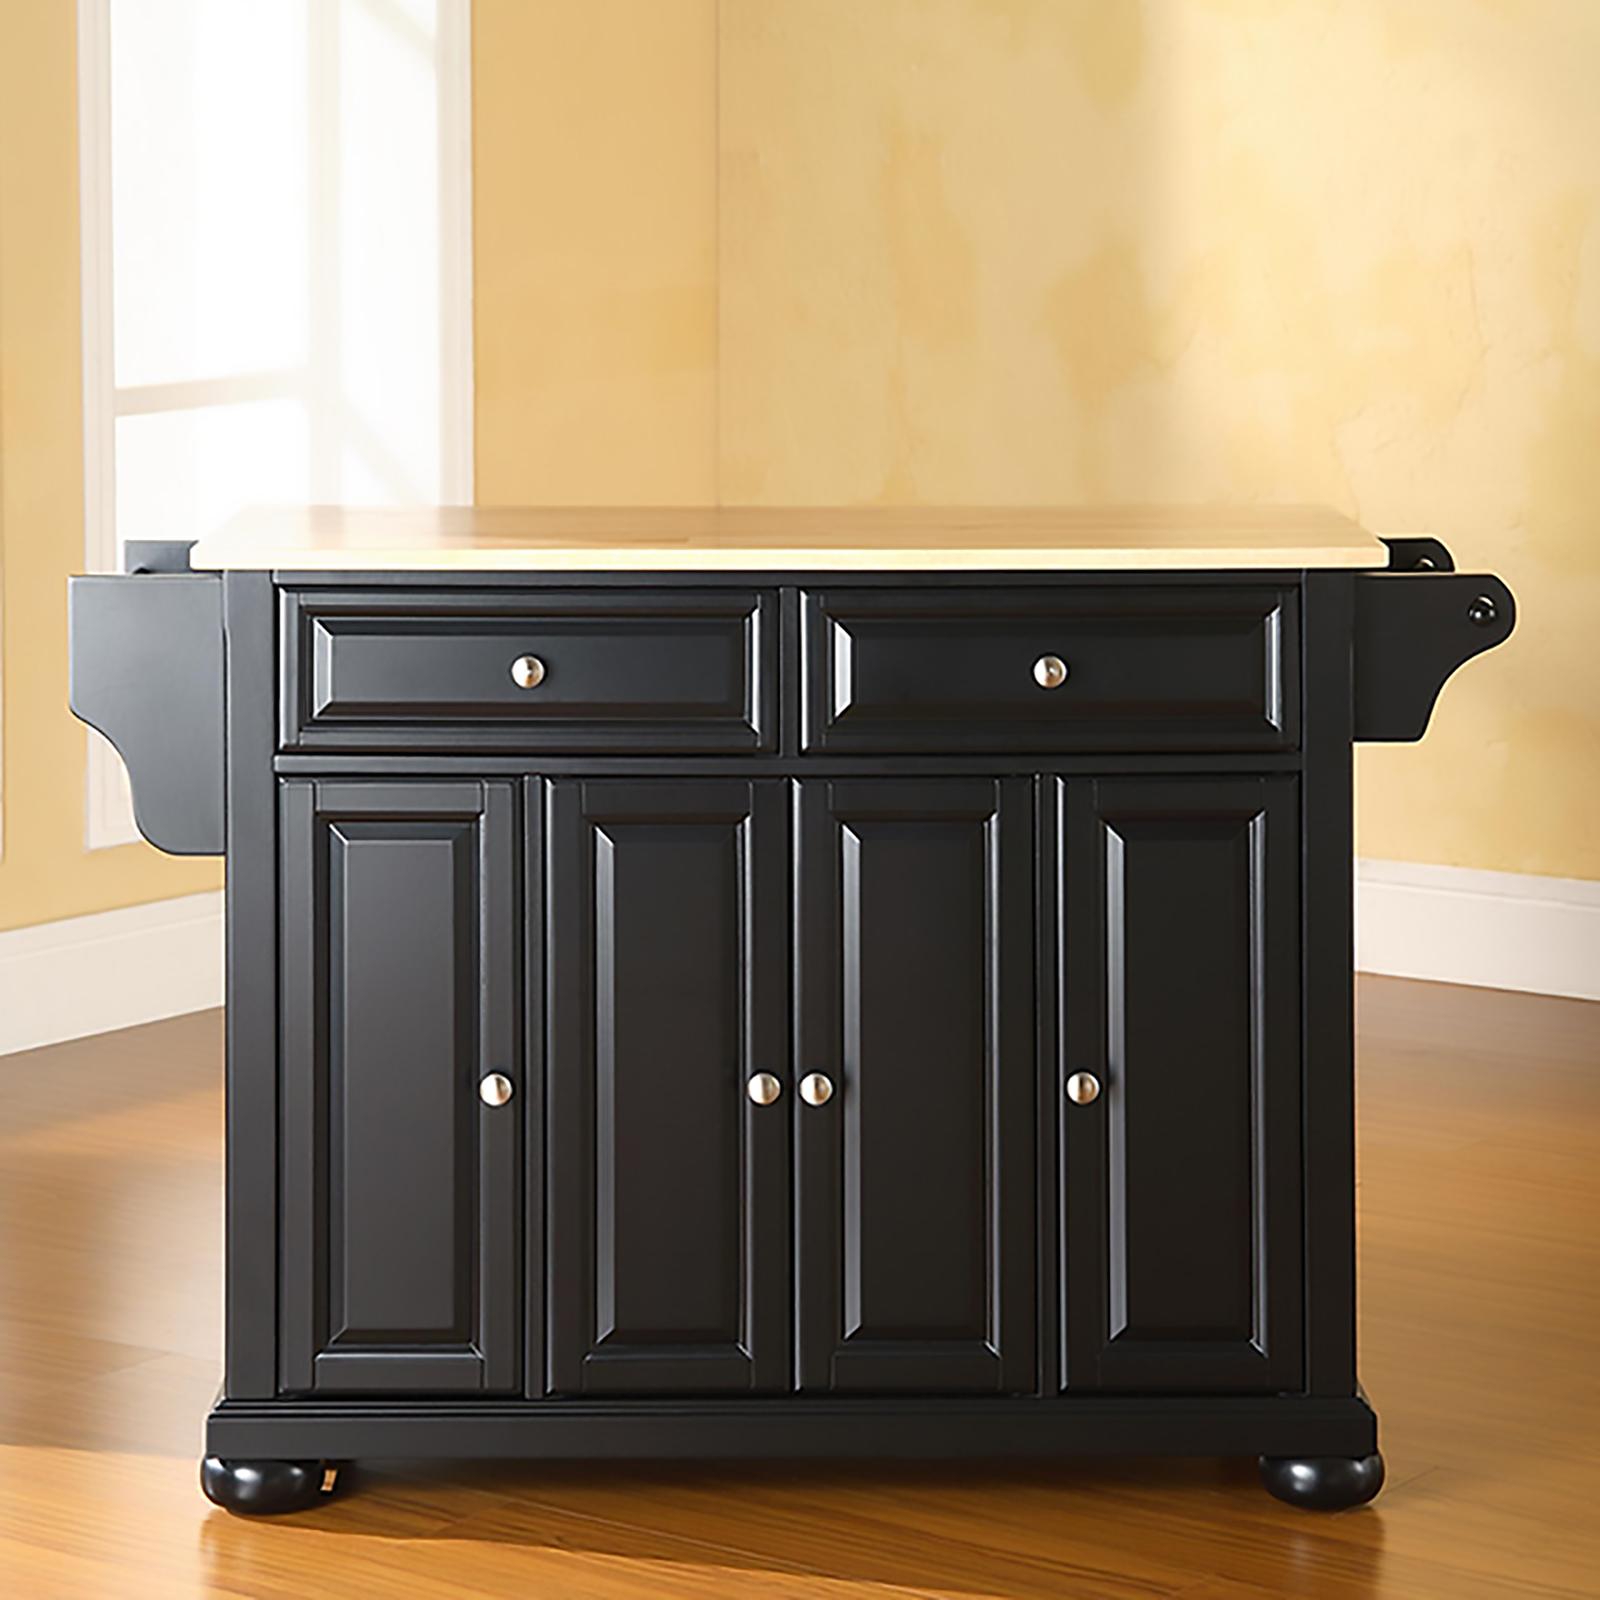 mahogany kitchen island best design software crosley furniture cambridge hardwood vintage